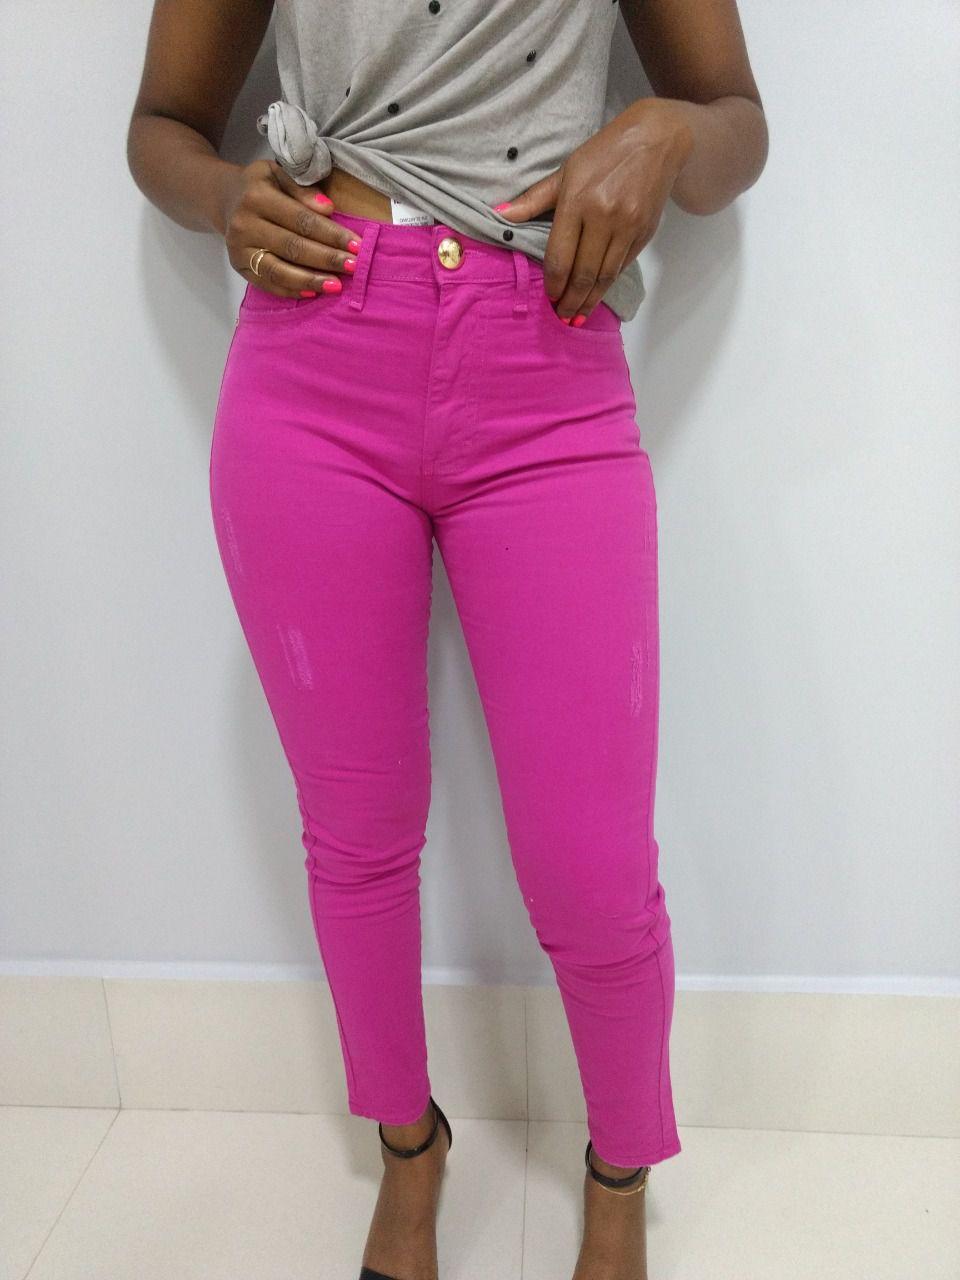 Calça Jeans Feminina Pink Sarja  - Pick Tita